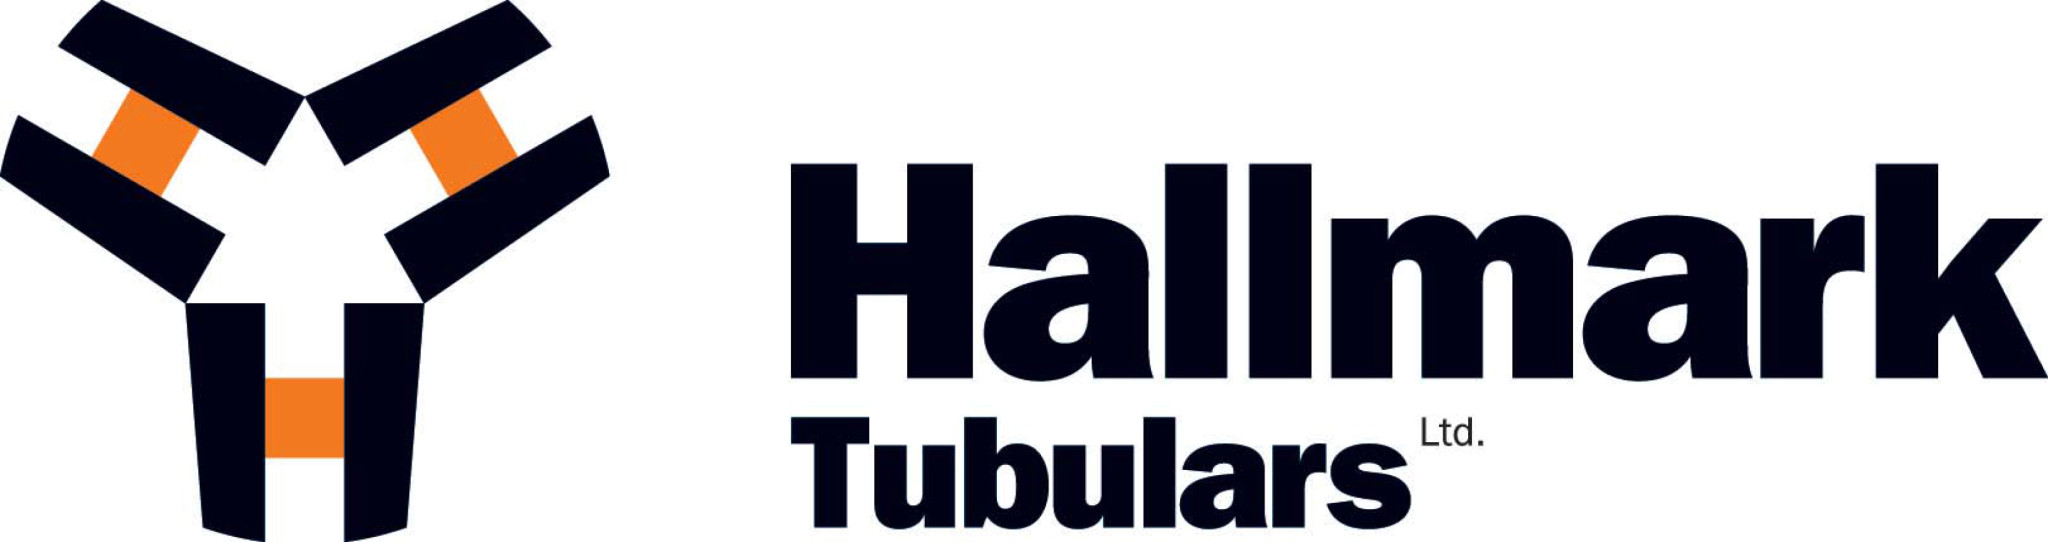 Hallmark Tubulars Ltd Logo